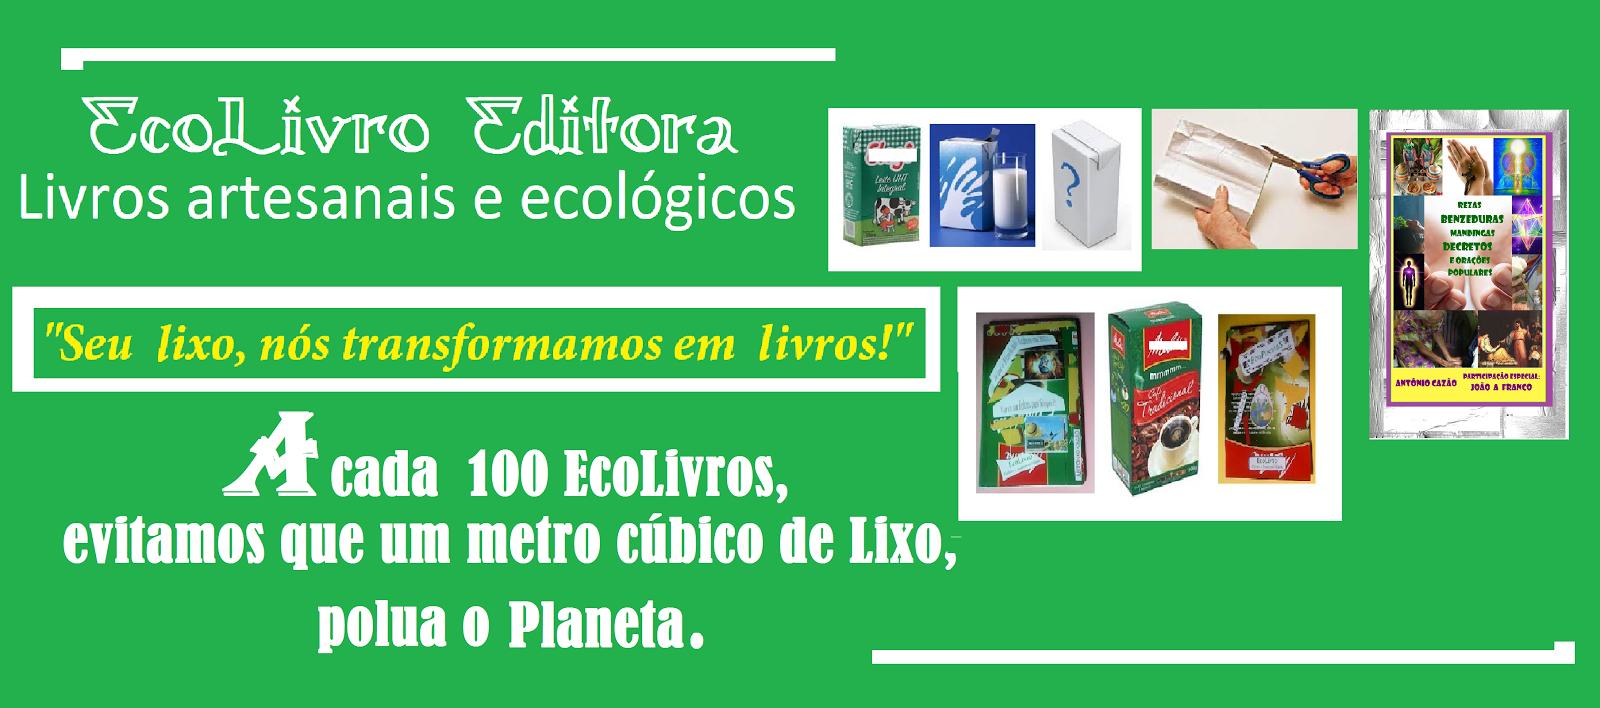 EcoLivro Editora